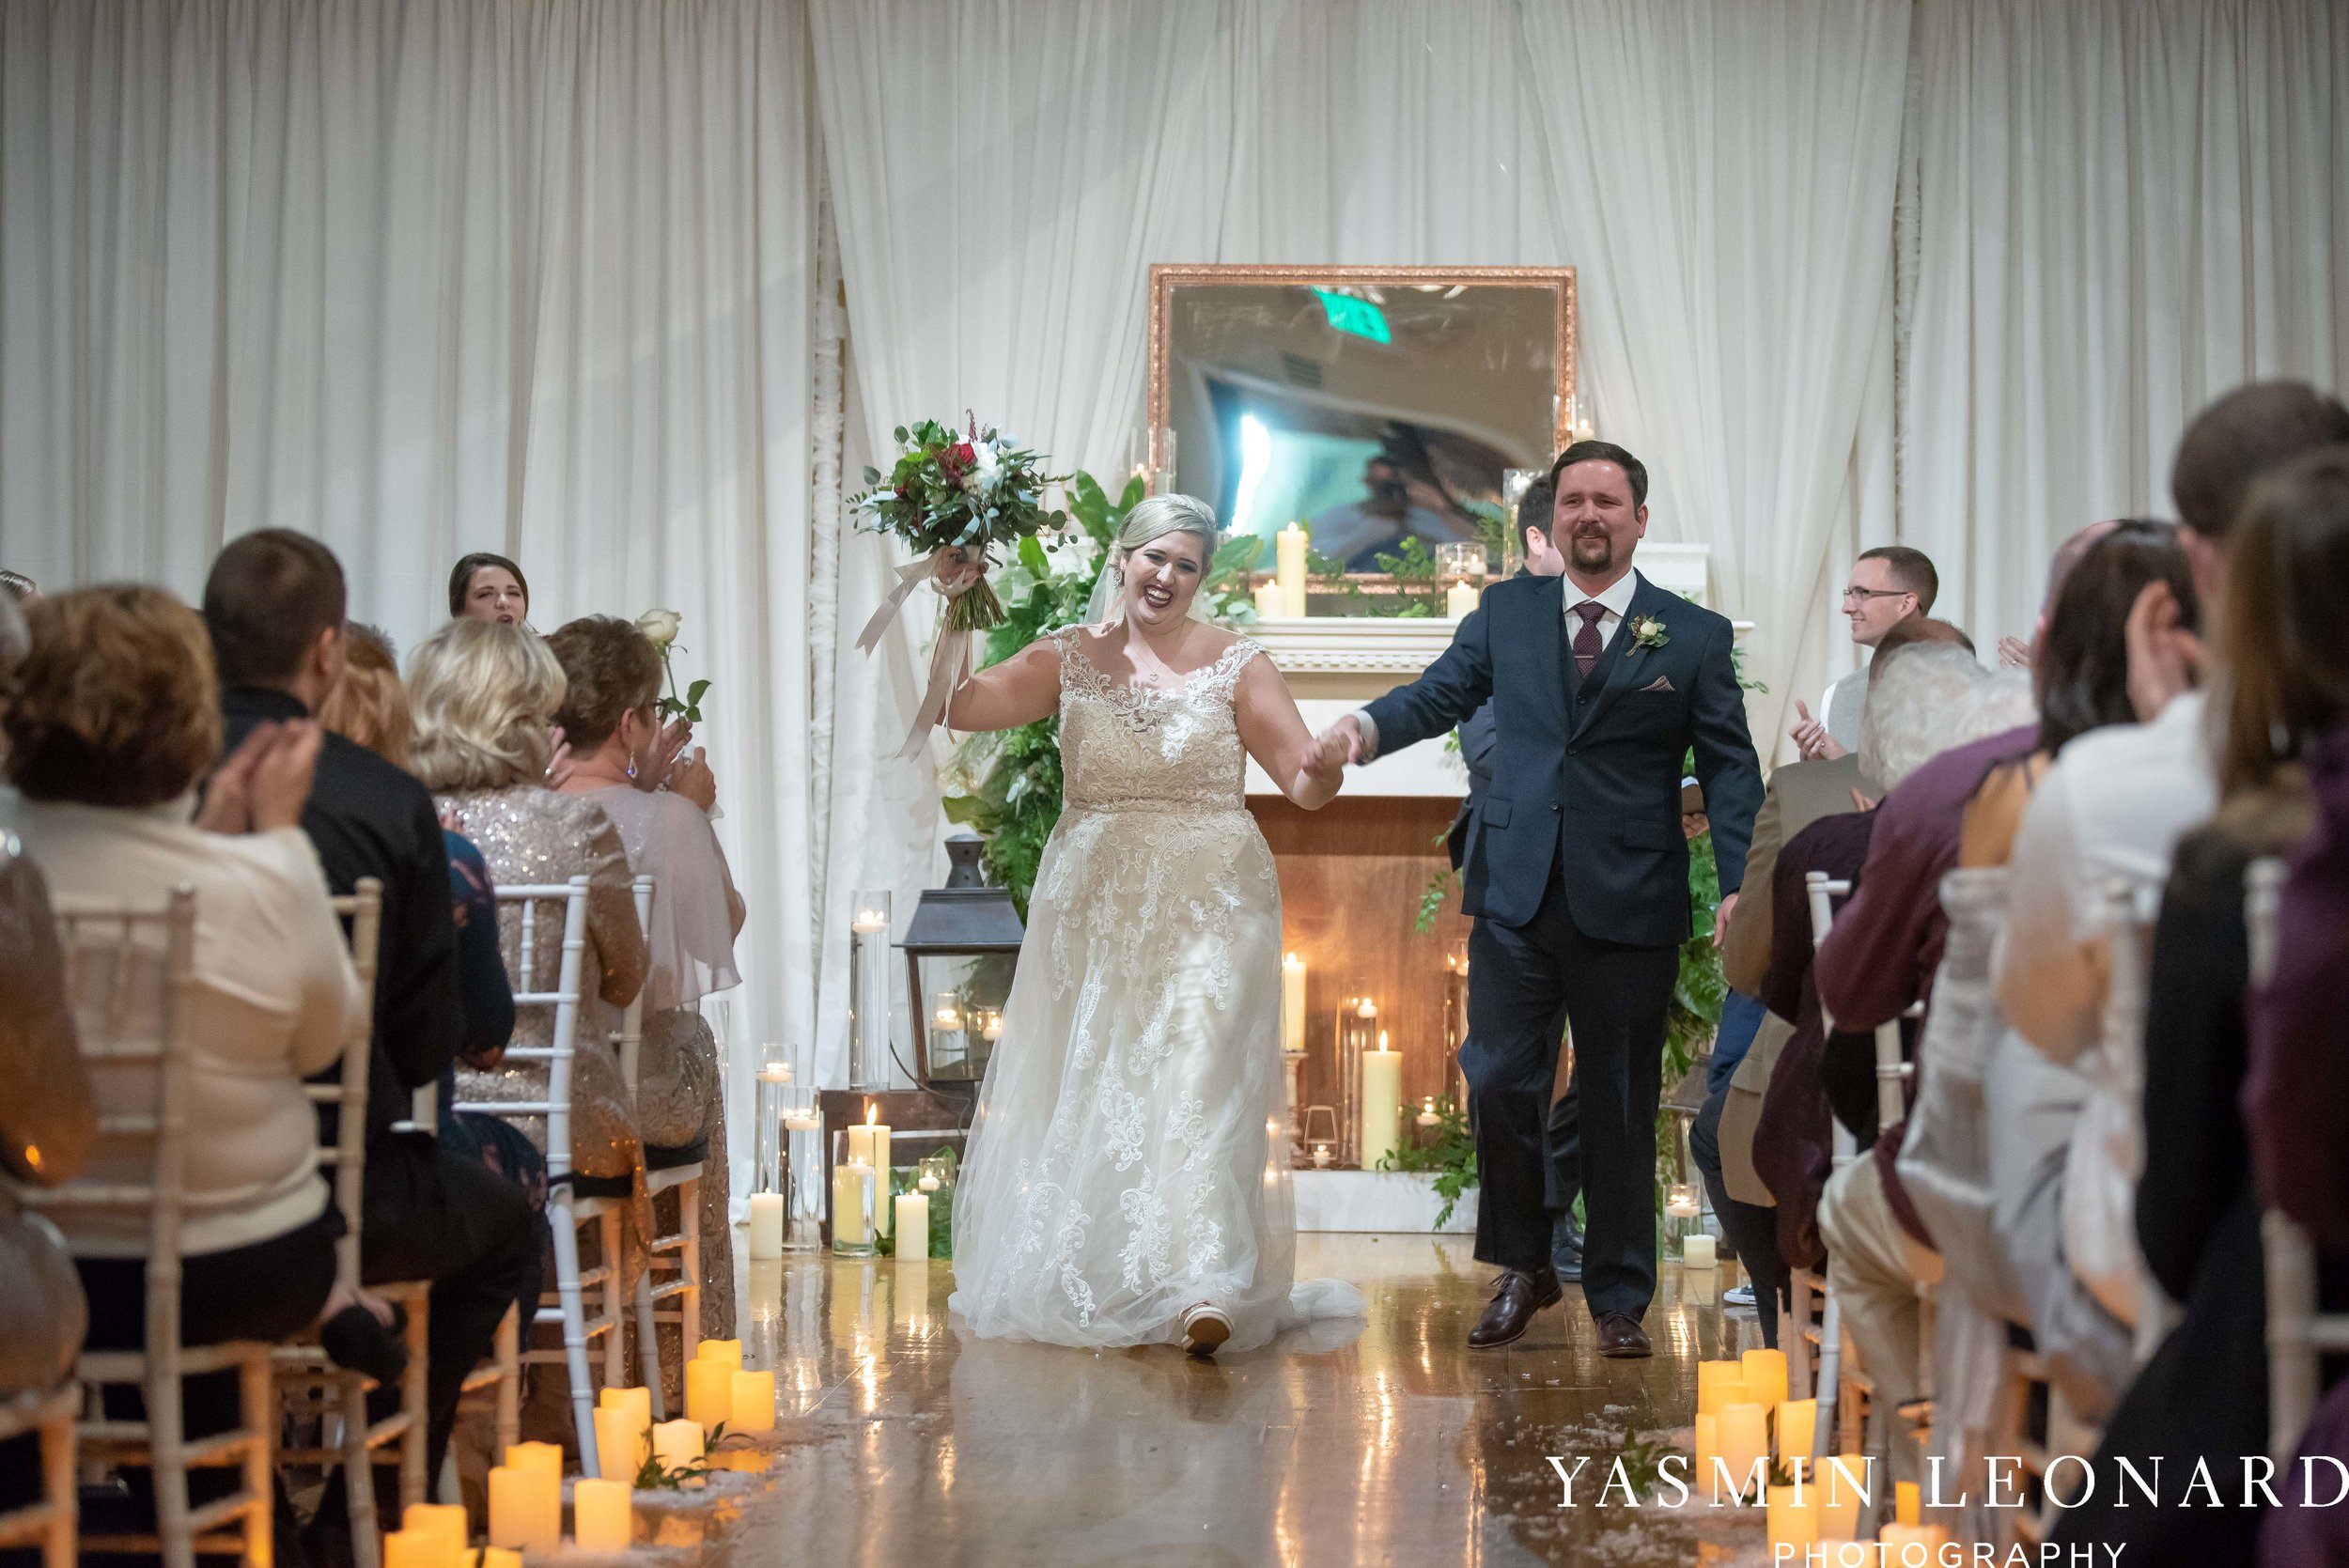 Rebekah and Matt - 105 Worth Event Centre - Yasmin Leonard Photography - Asheboro Wedding - NC Wedding - High Point Weddings - Triad Weddings - Winter Wedding-31.jpg